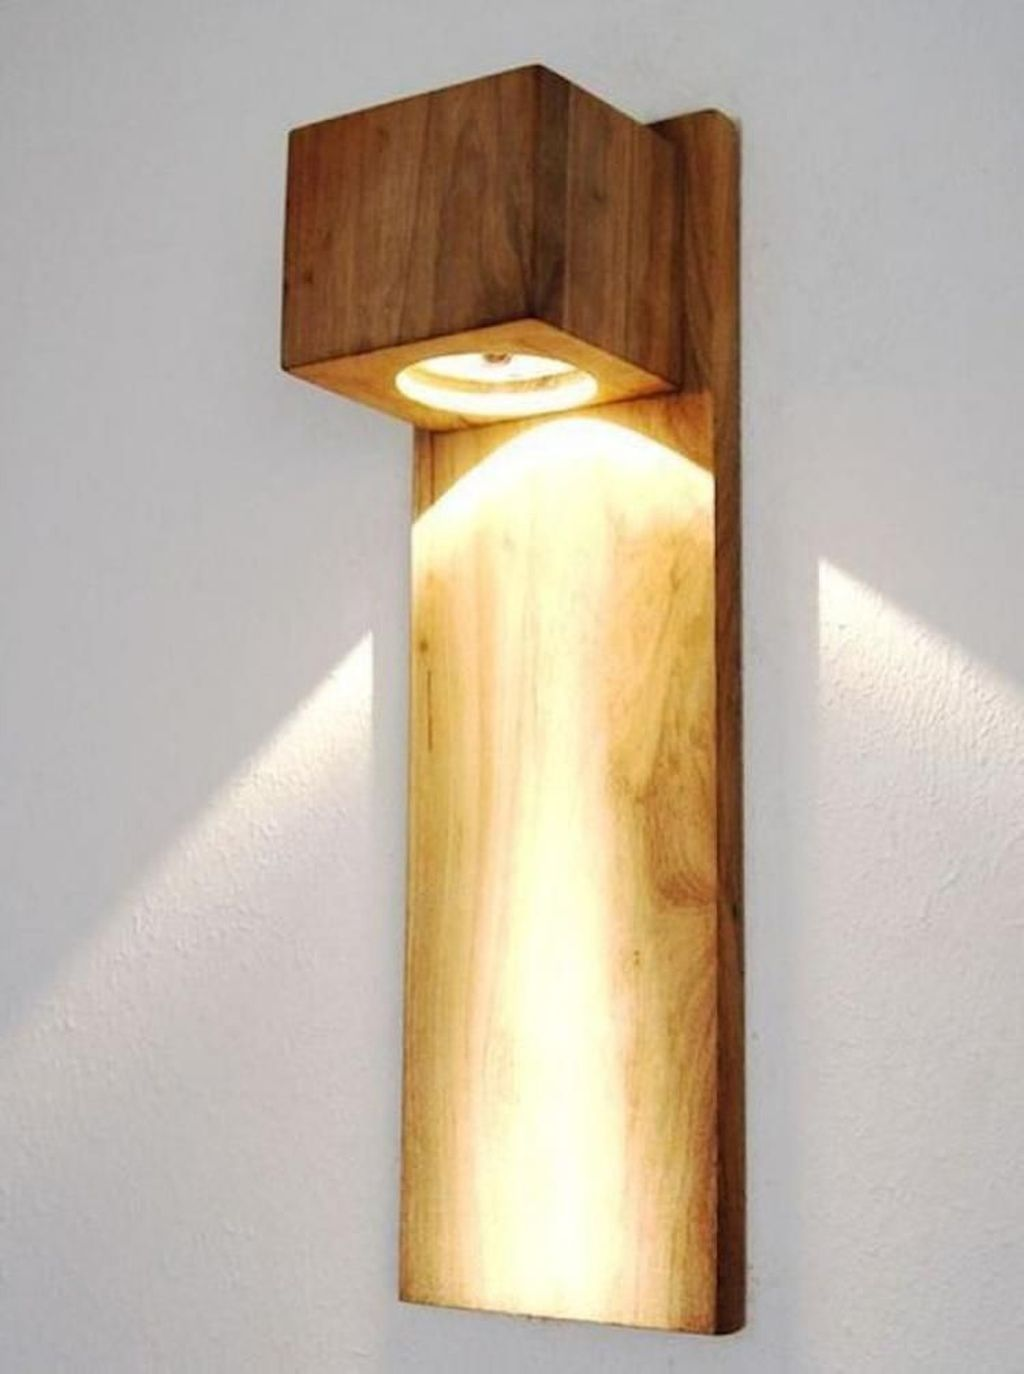 inspiring diy wooden lamps decorating ideas home design pinterest